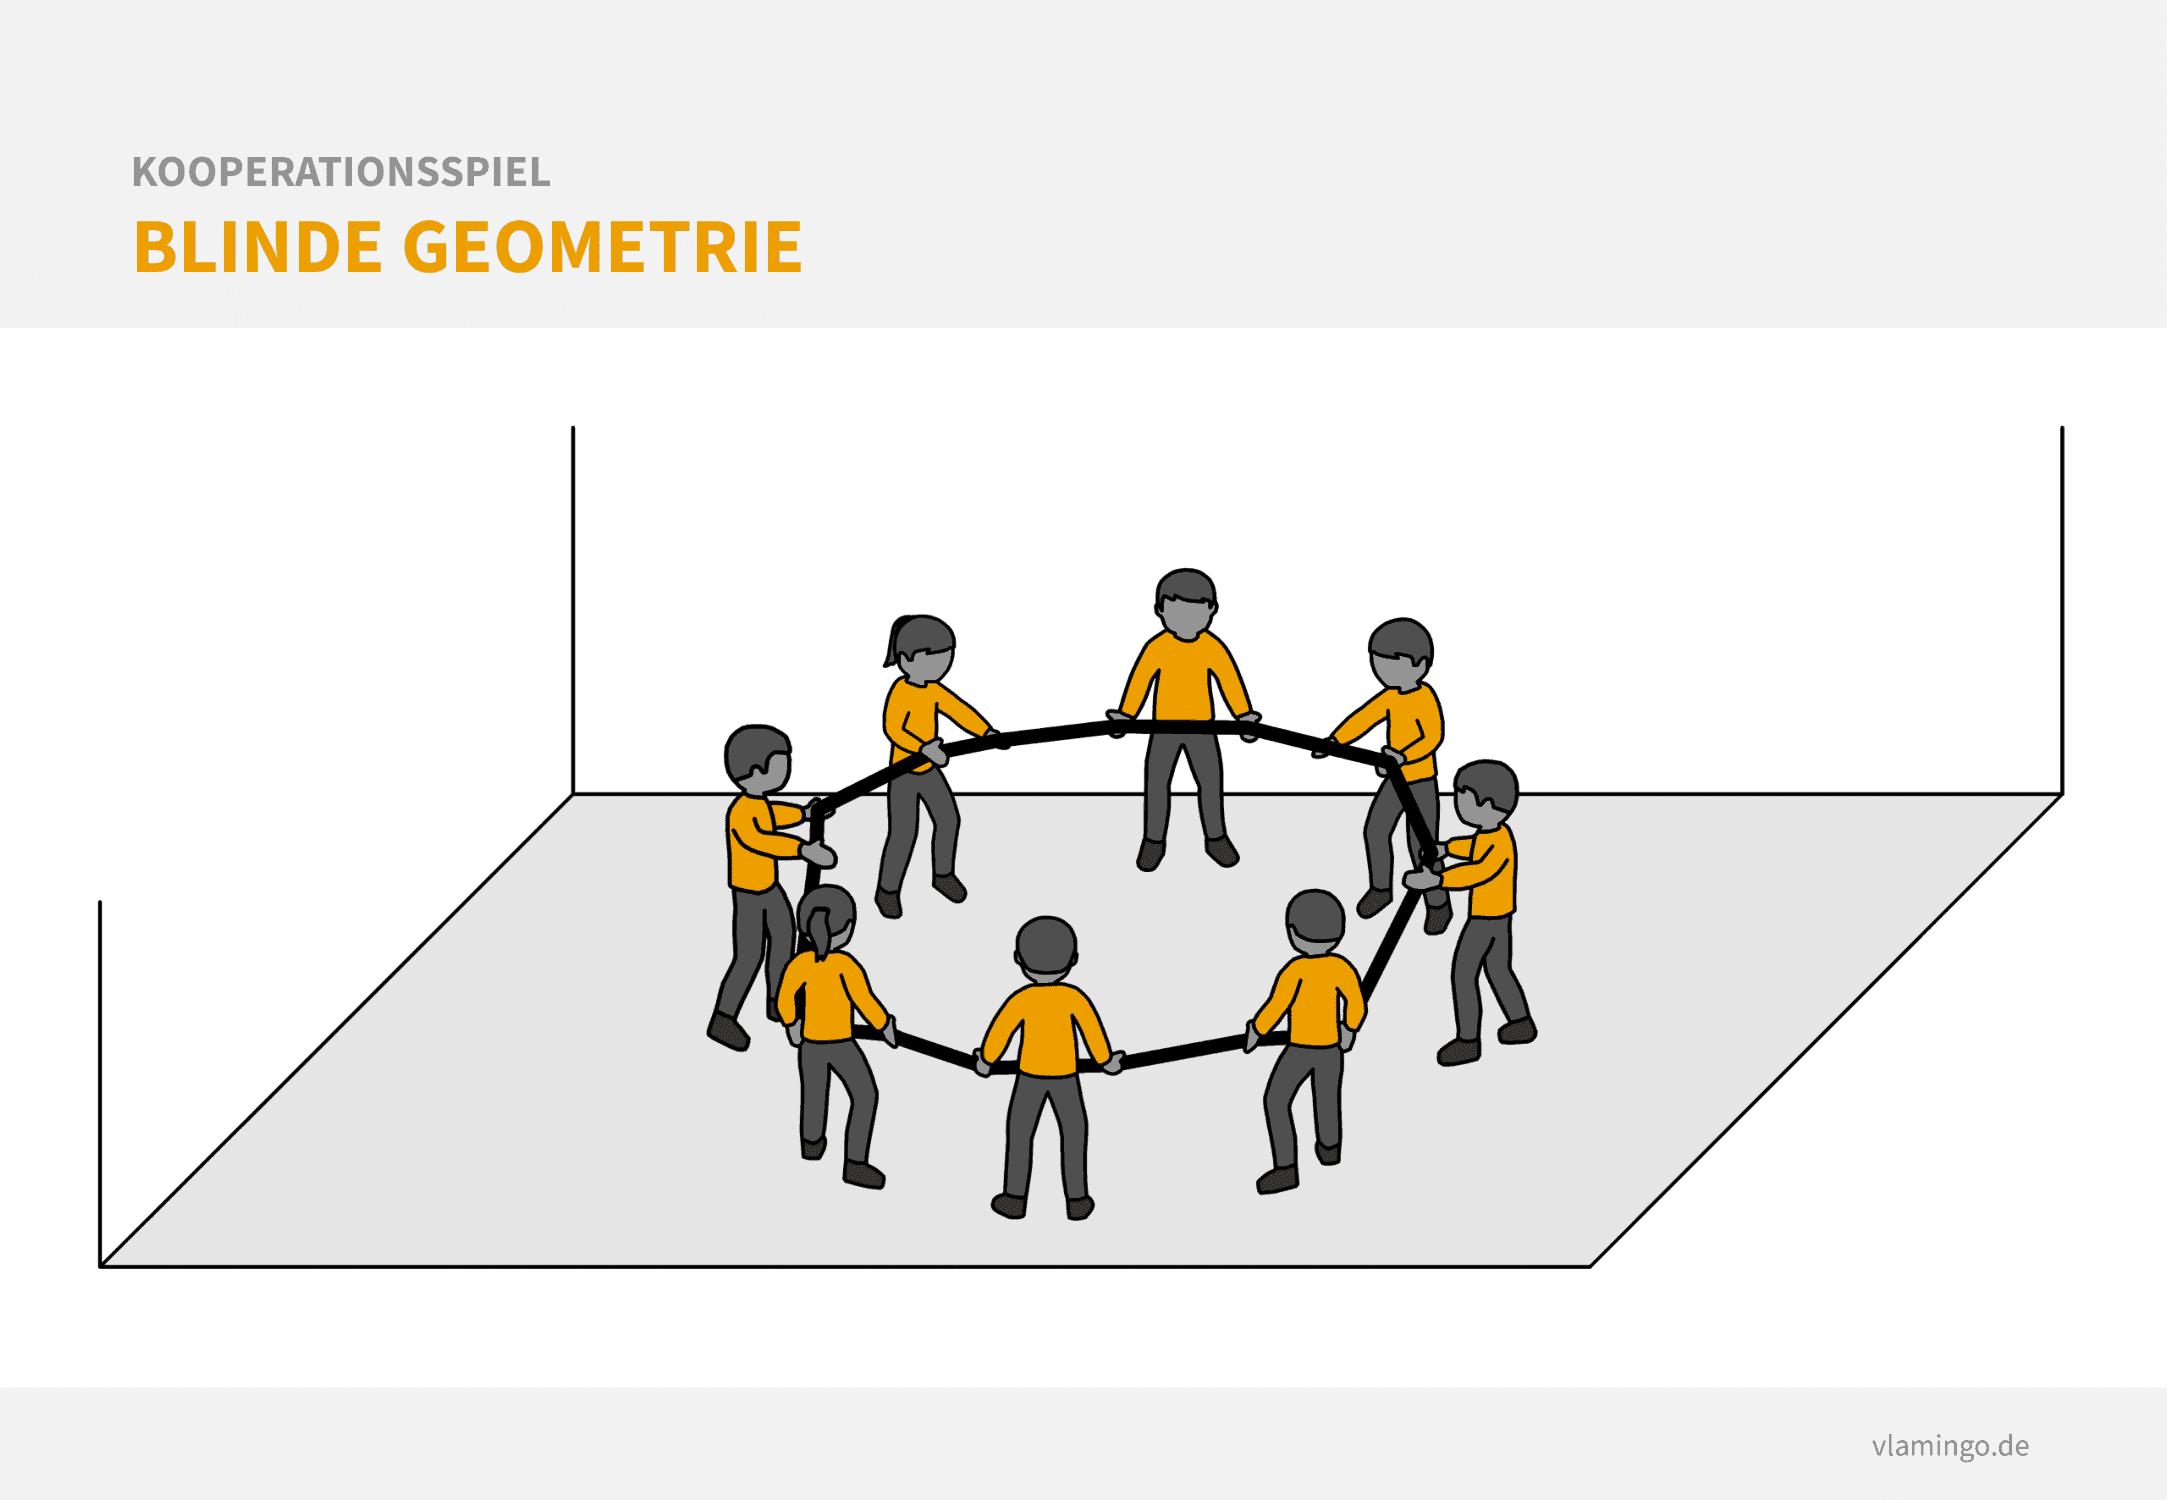 Kooperationsspiel: Blinde Geometrie